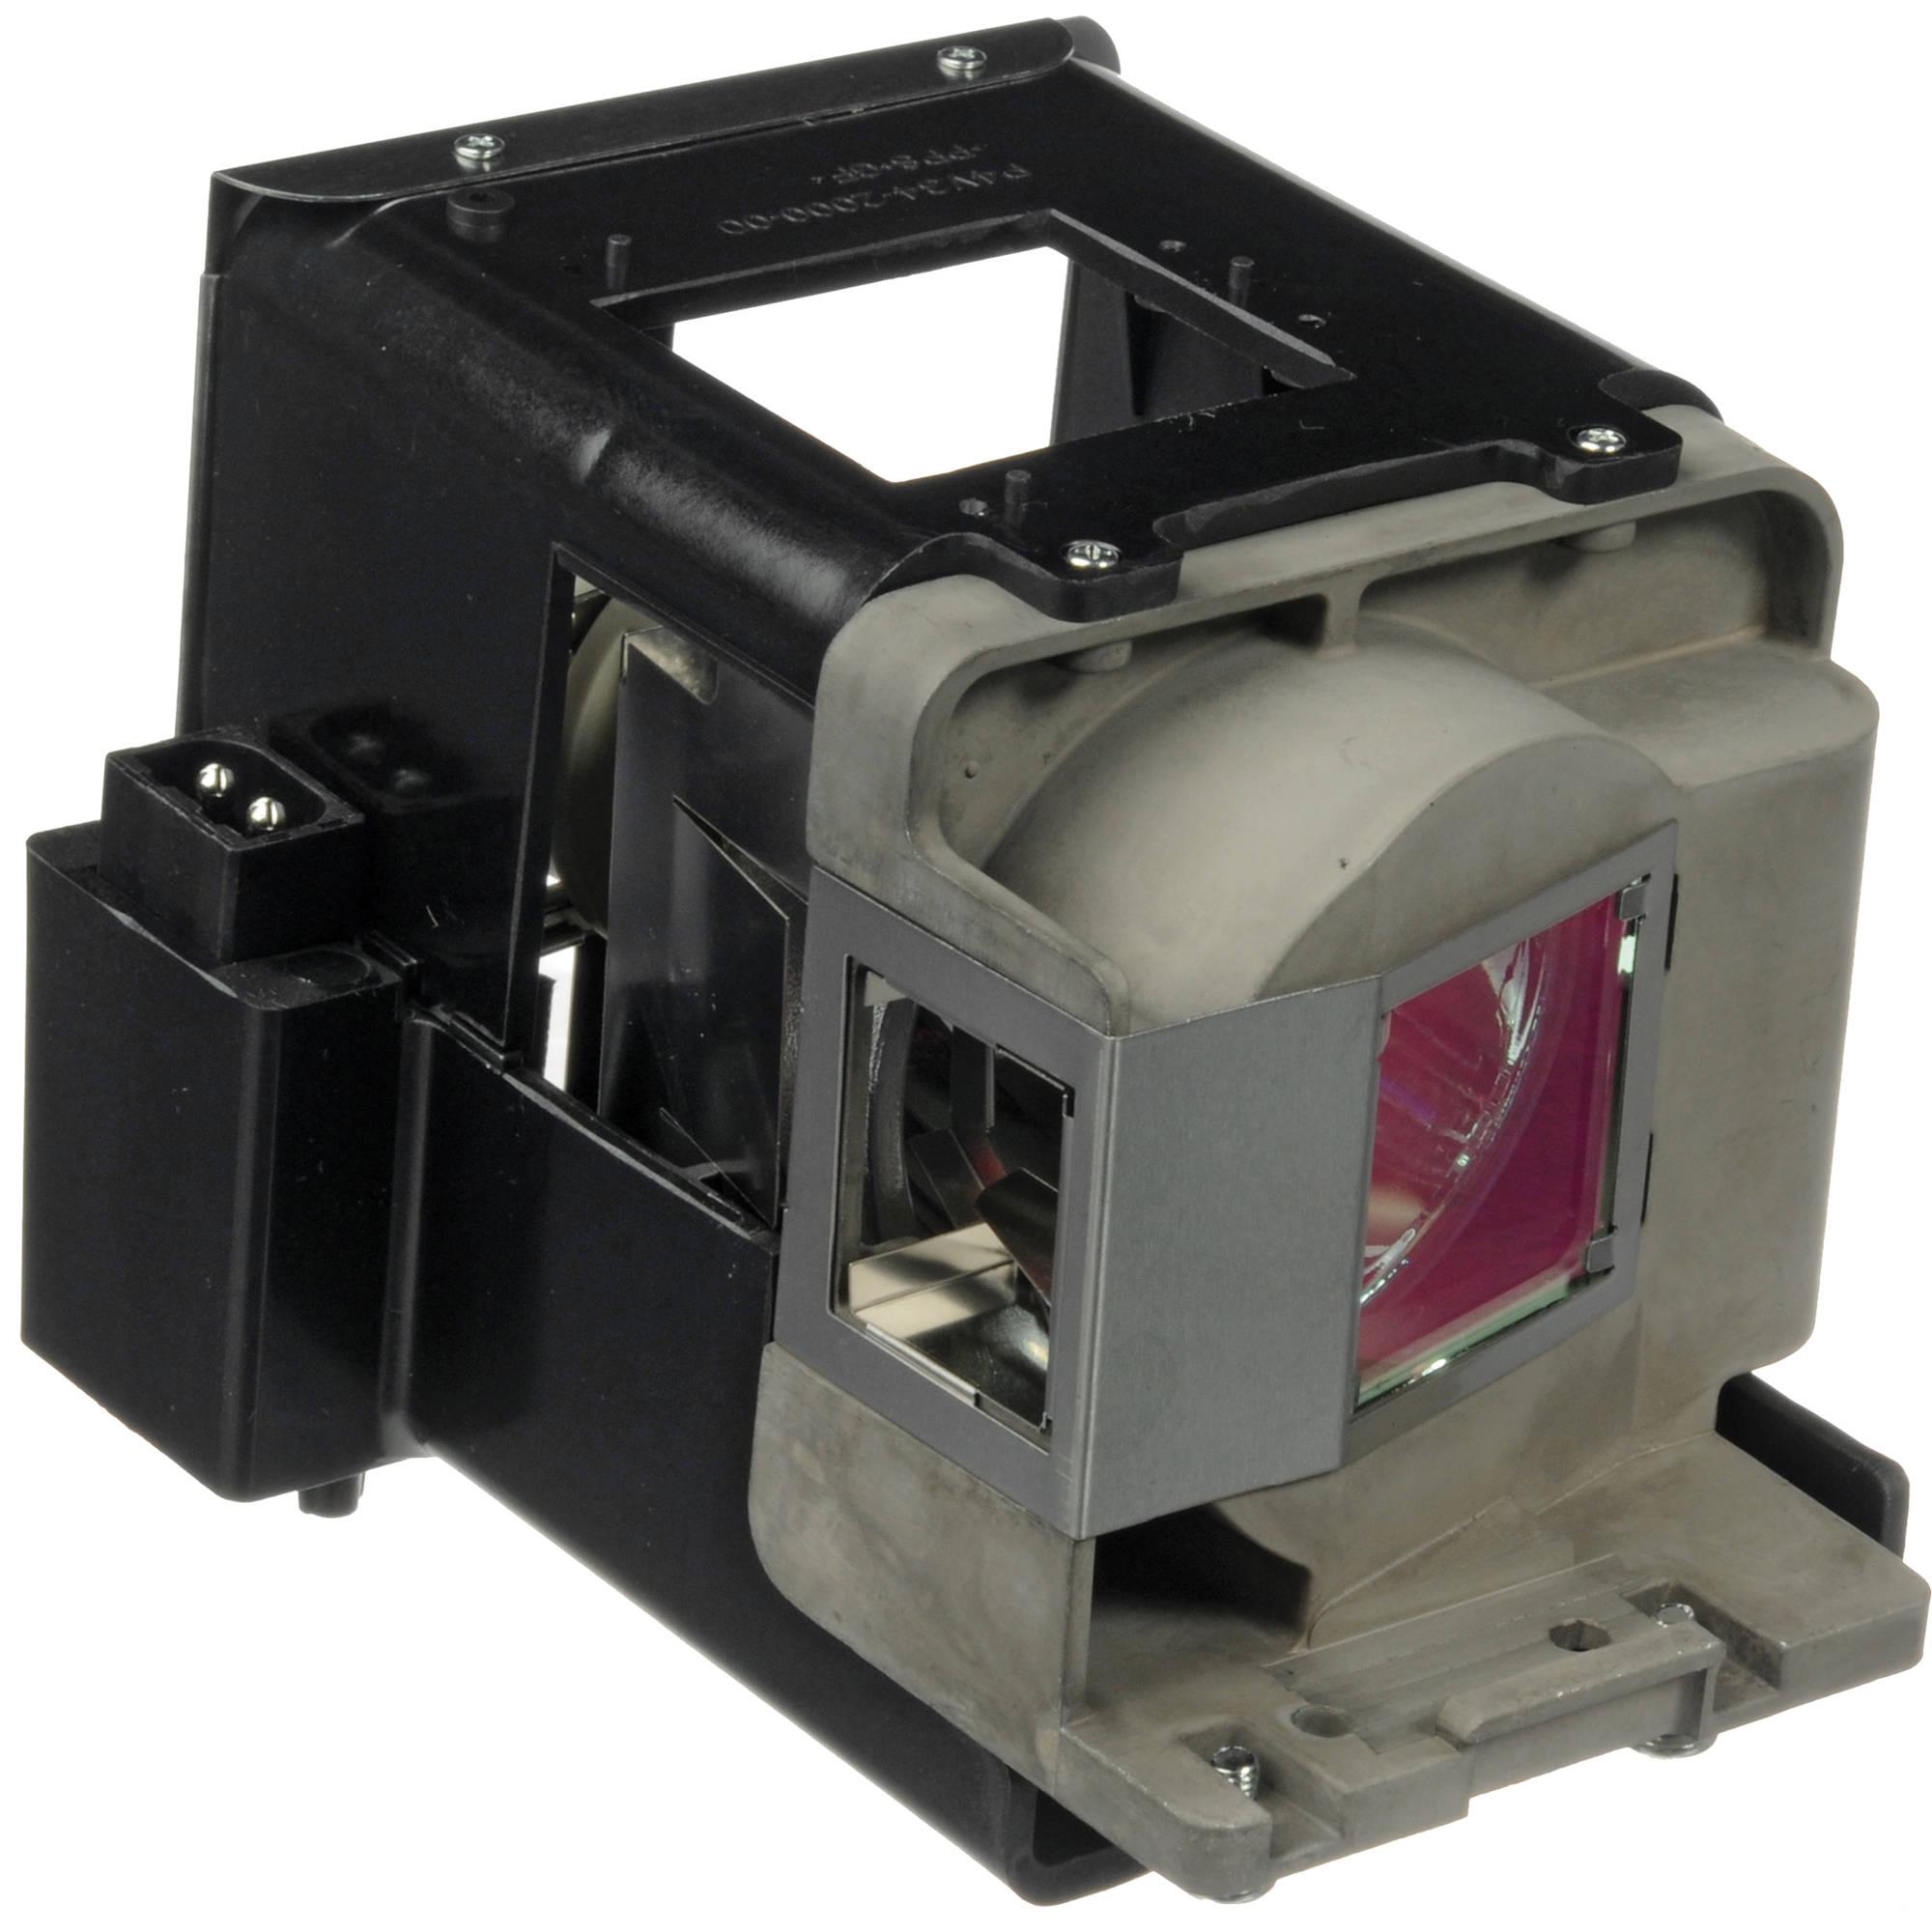 BenQ 5J.J4J05.001 Replacement Lamp for SH910 5J.J4J05.001 B&H